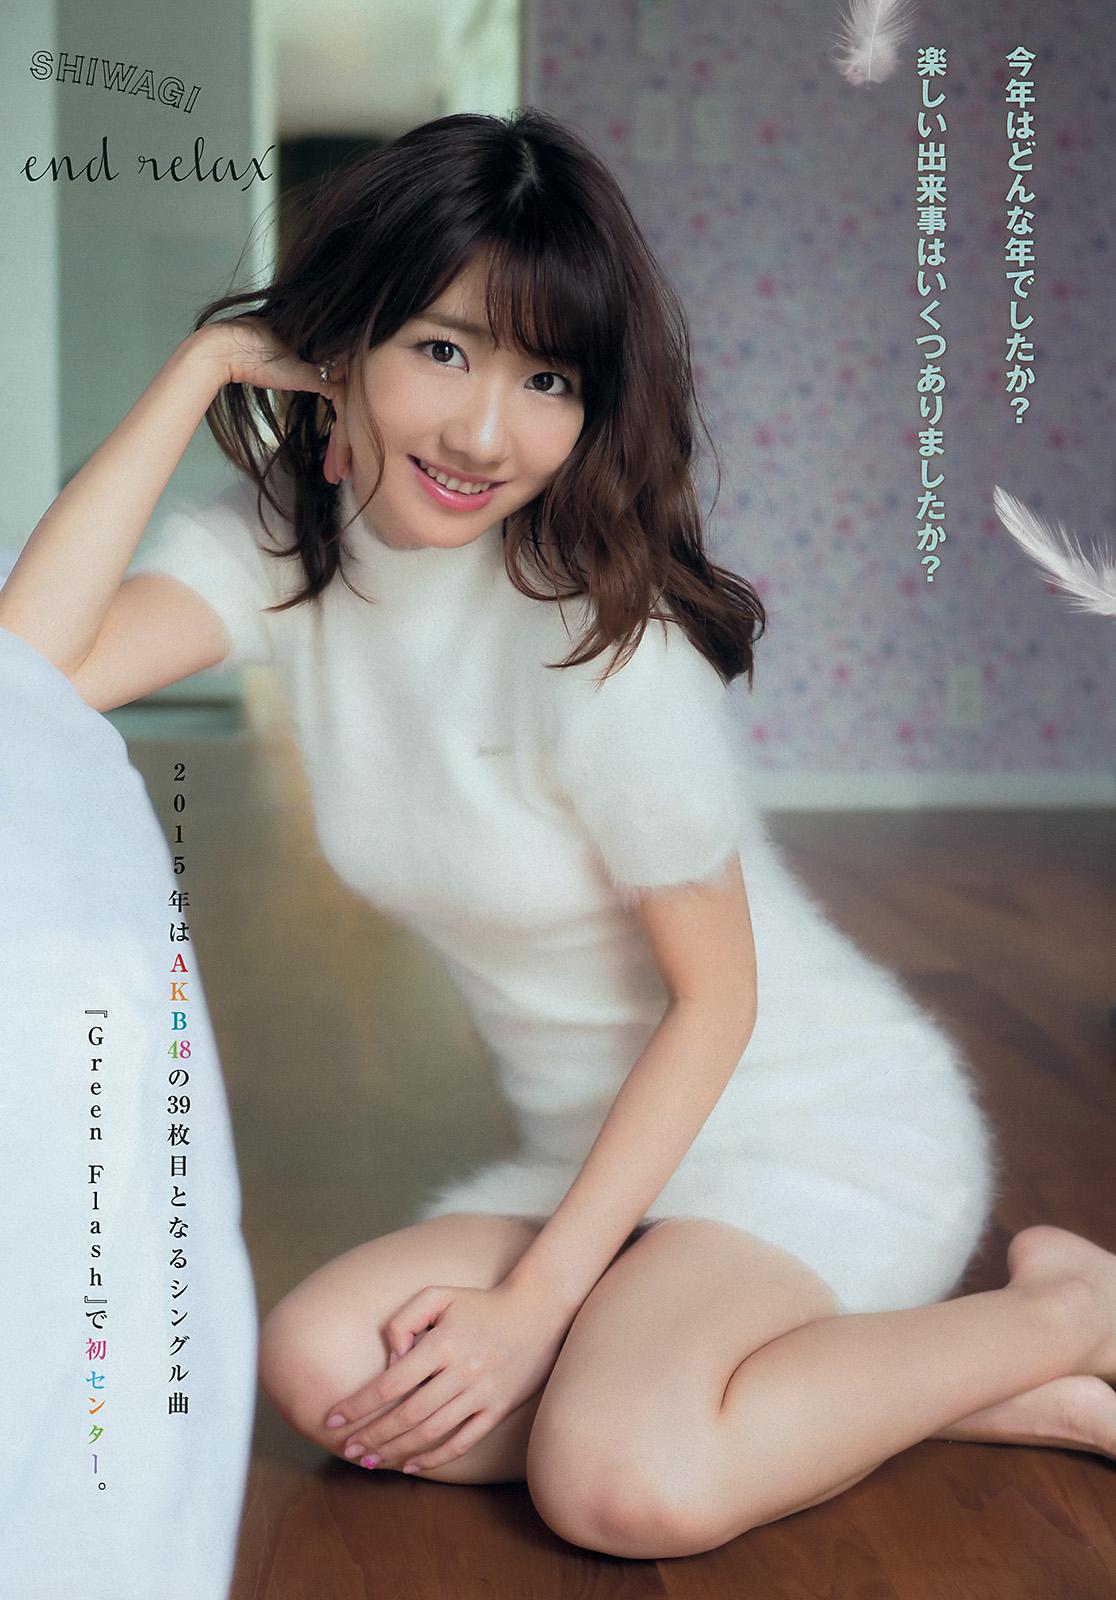 Kashiwagi Yuki 柏木由紀 Young Magazine 2016 No 2 Pictures 2